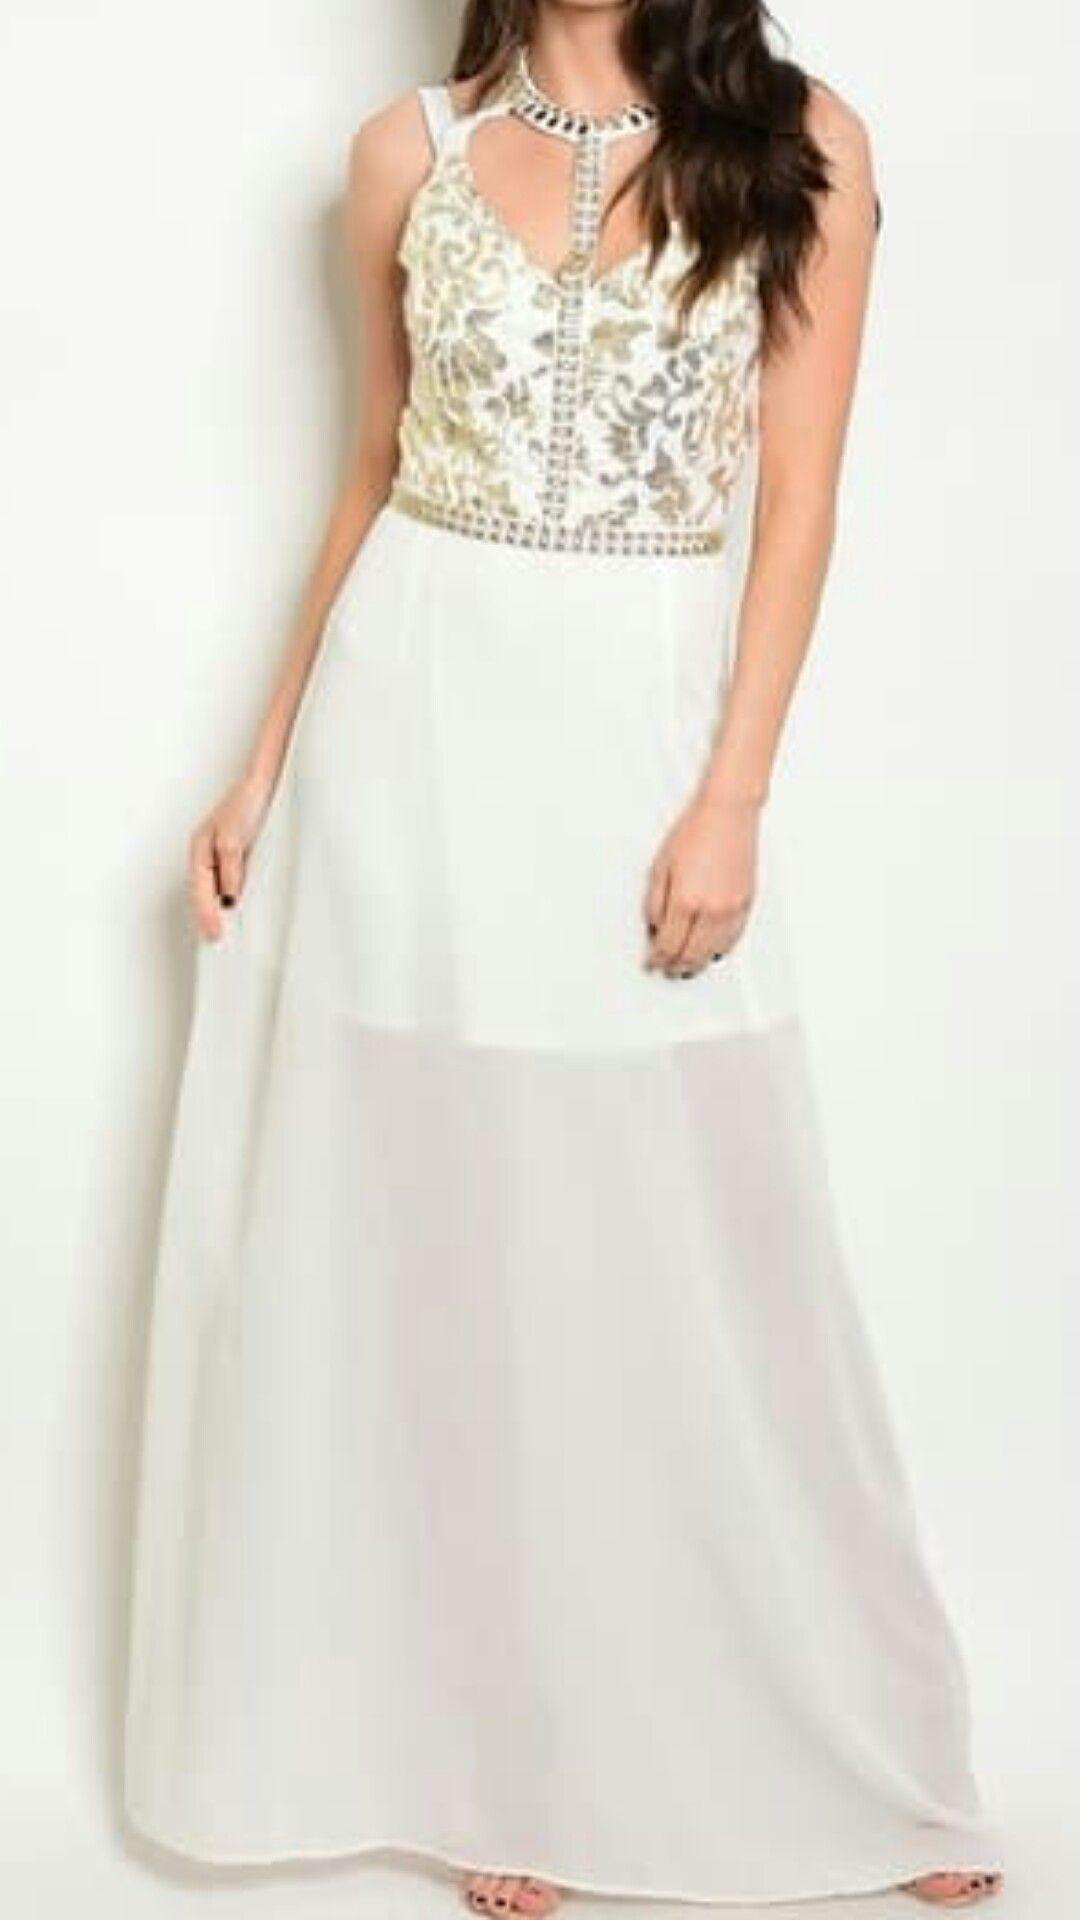 Simple modern wedding dress  Modern Wedding Dress Simple Elegant Aline Floor Length Chiffon